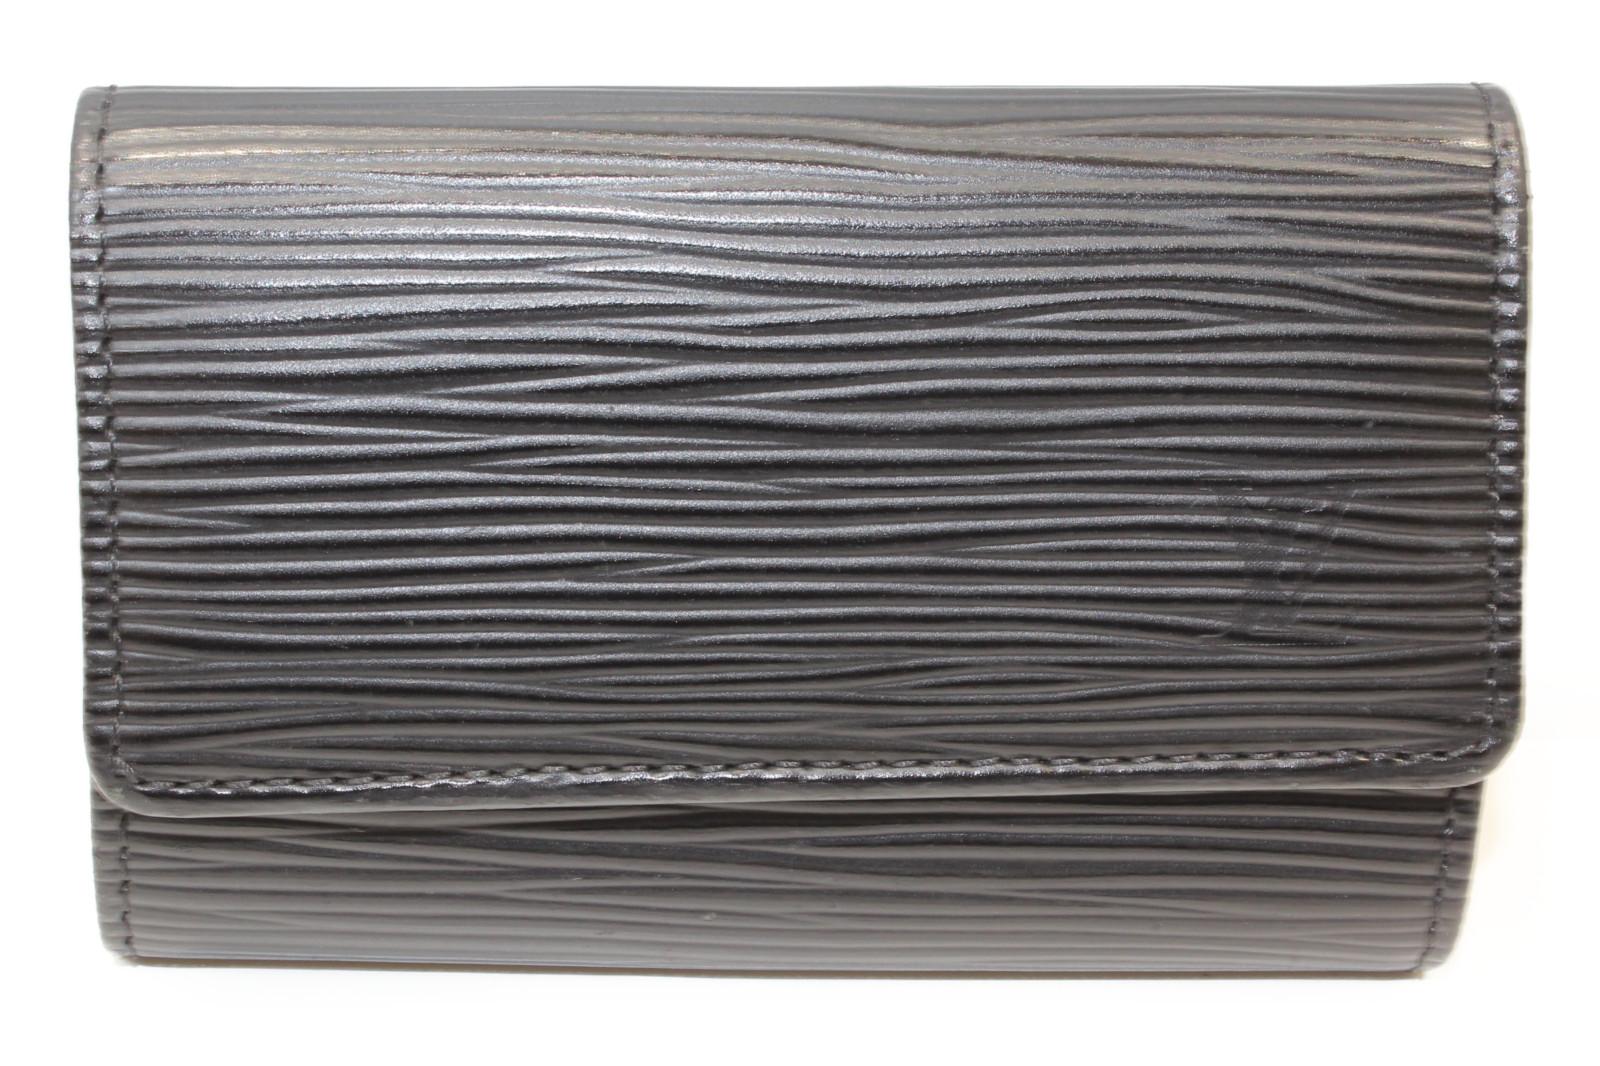 LOUIS VUITTON ルイヴィトンミュルティクレ6 M63812エピ ブラック6連キーケースプレゼント包装可 【中古】